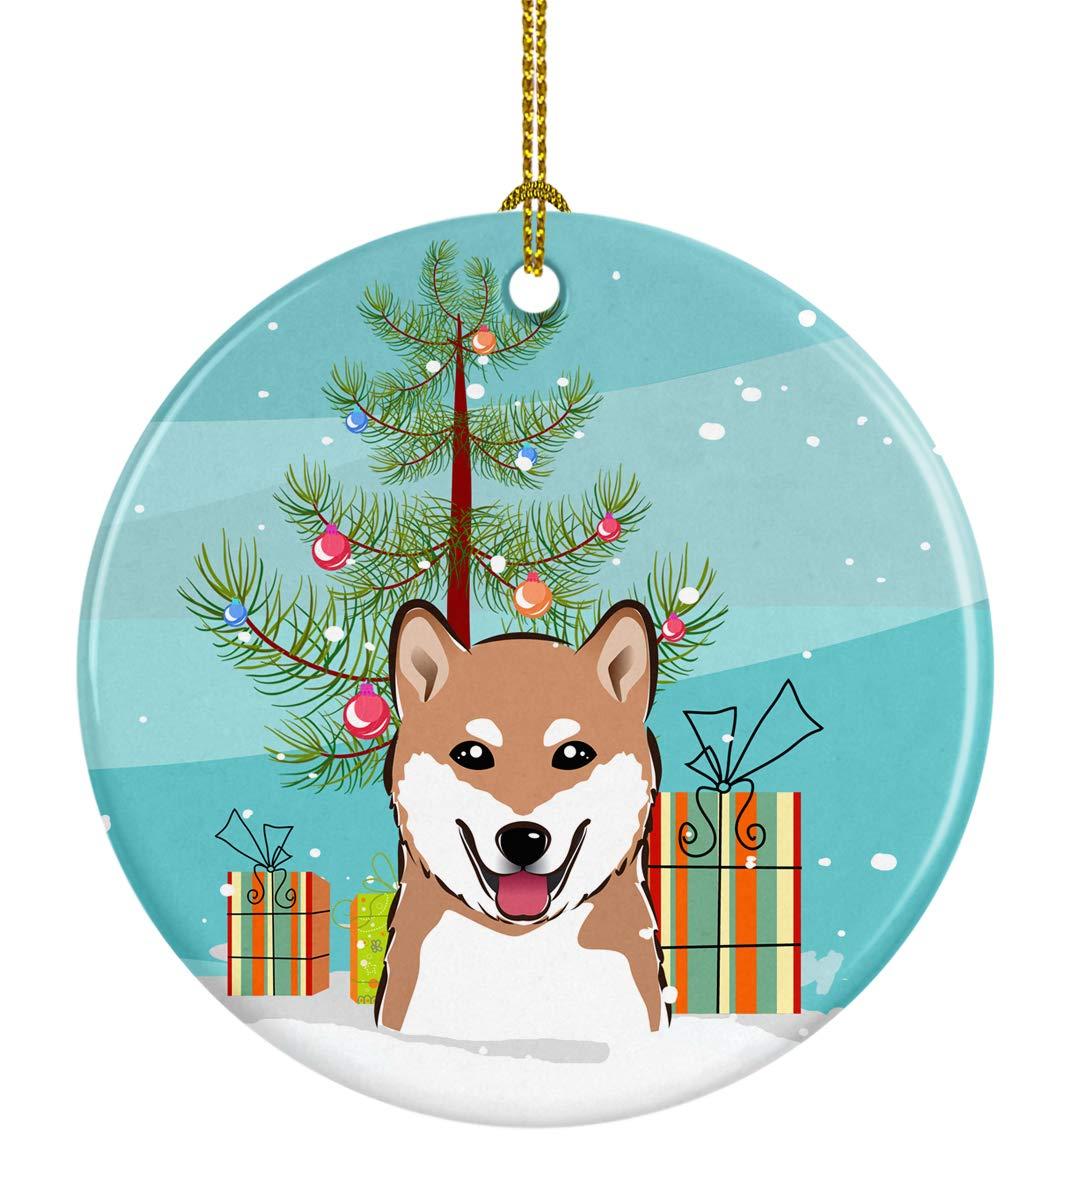 Carolines-Treasures-BB1597CO1-Christmas-Tree-and-Shiba-Inu-Ceramic-Ornament-3-in-Multicolor